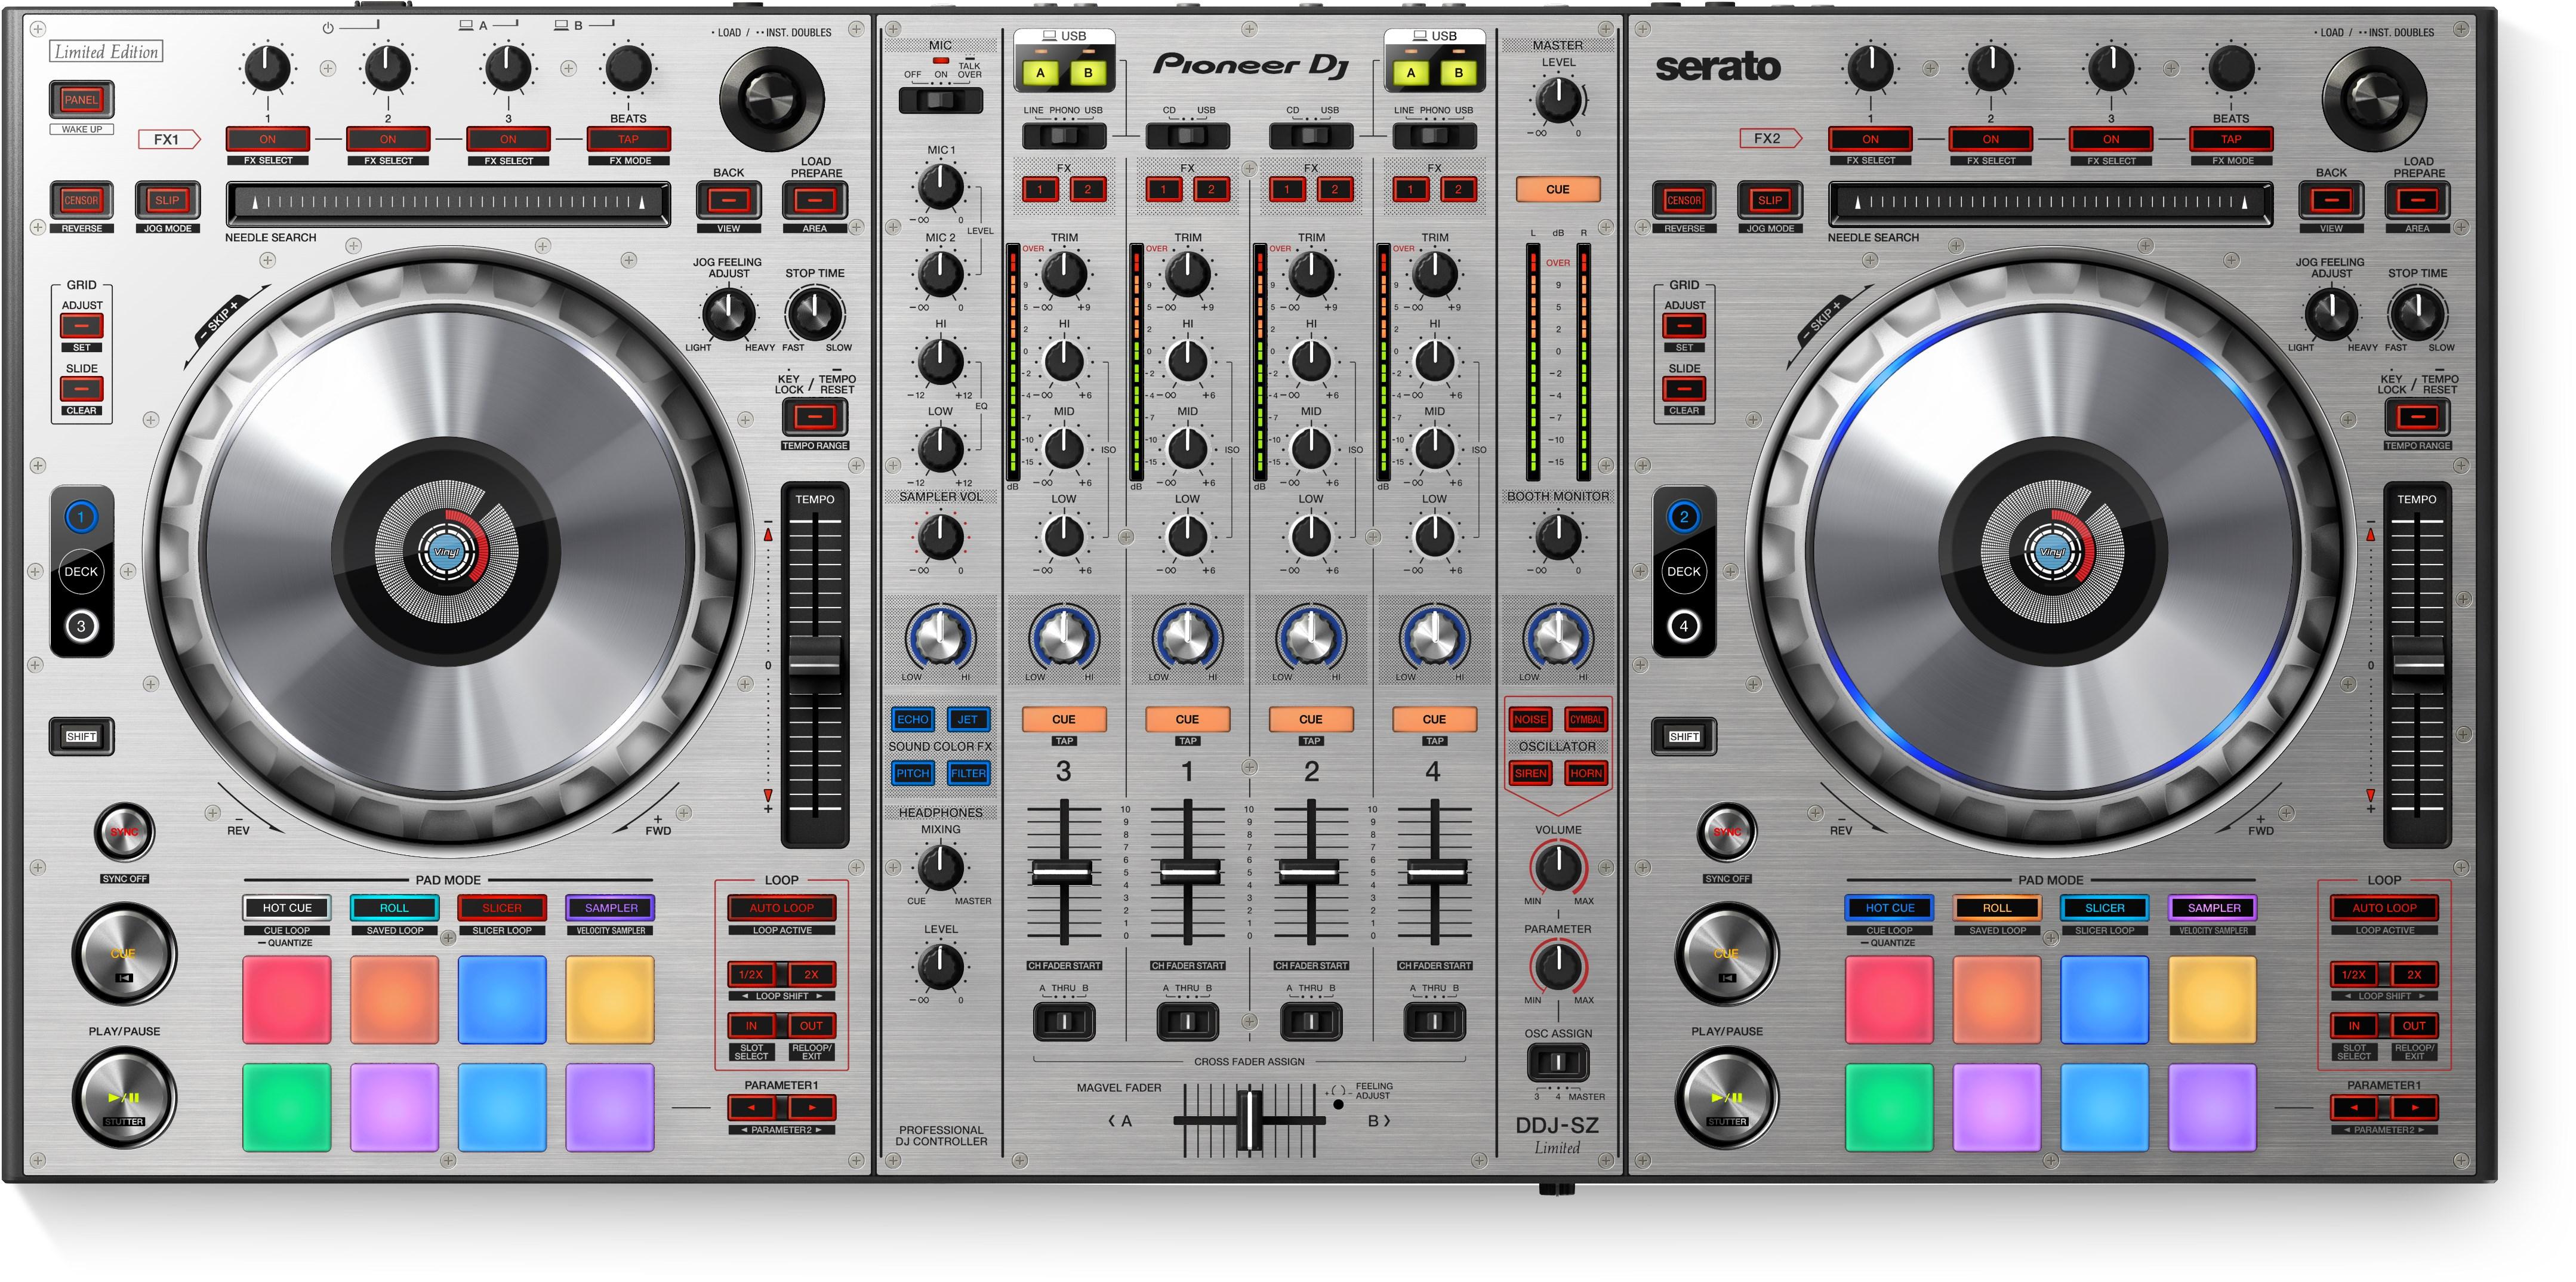 Pioneer DDJ-SZ 4 Channel DJ Controller For Serato DJ - Silver - Long